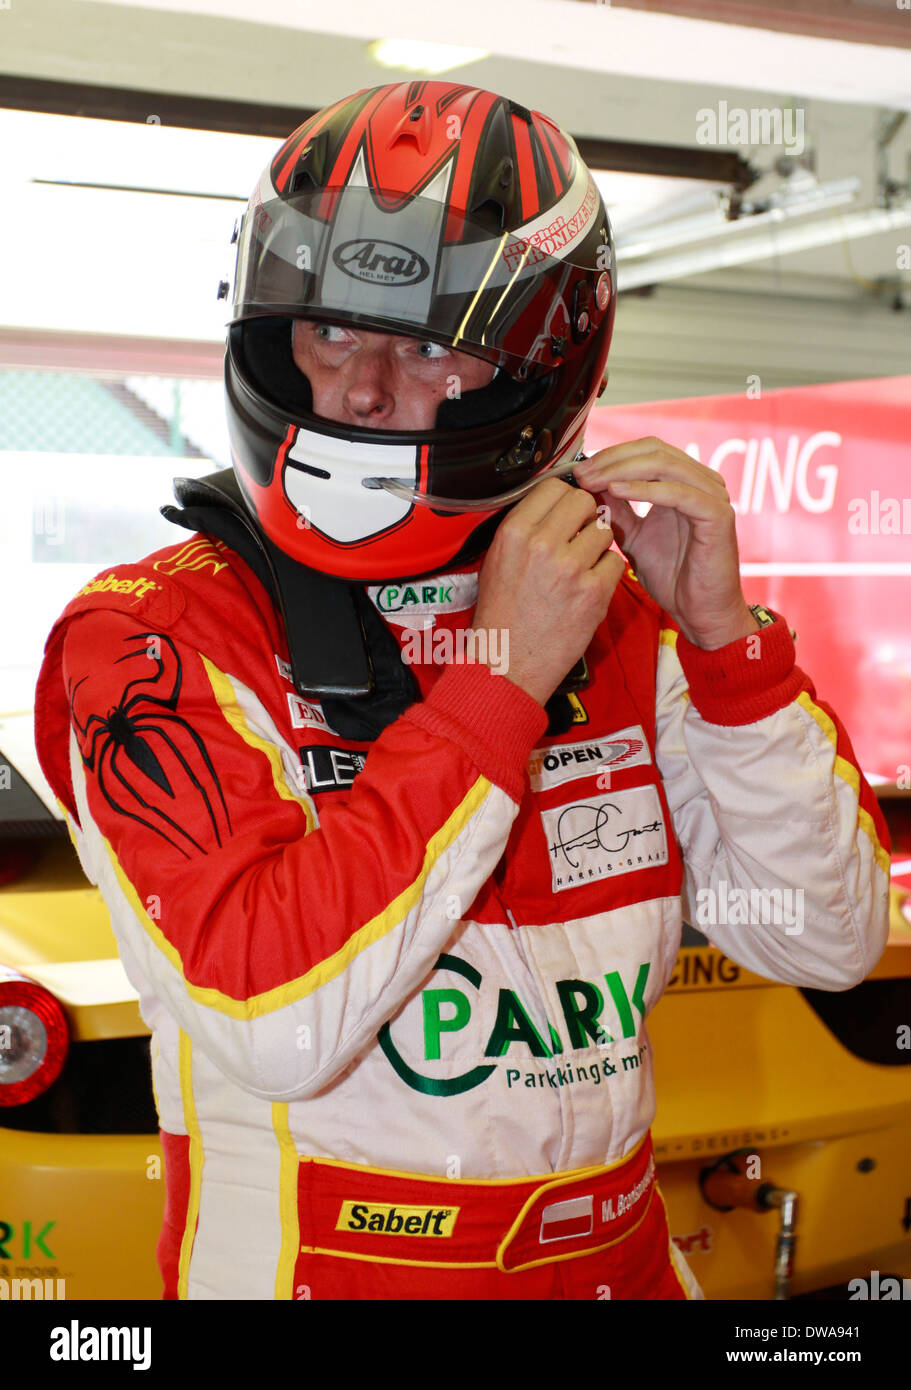 Portrait of polish racing driver Stanislaw Broniszewski during GT Open race on Hungaroring in September 2012 - Stock Image